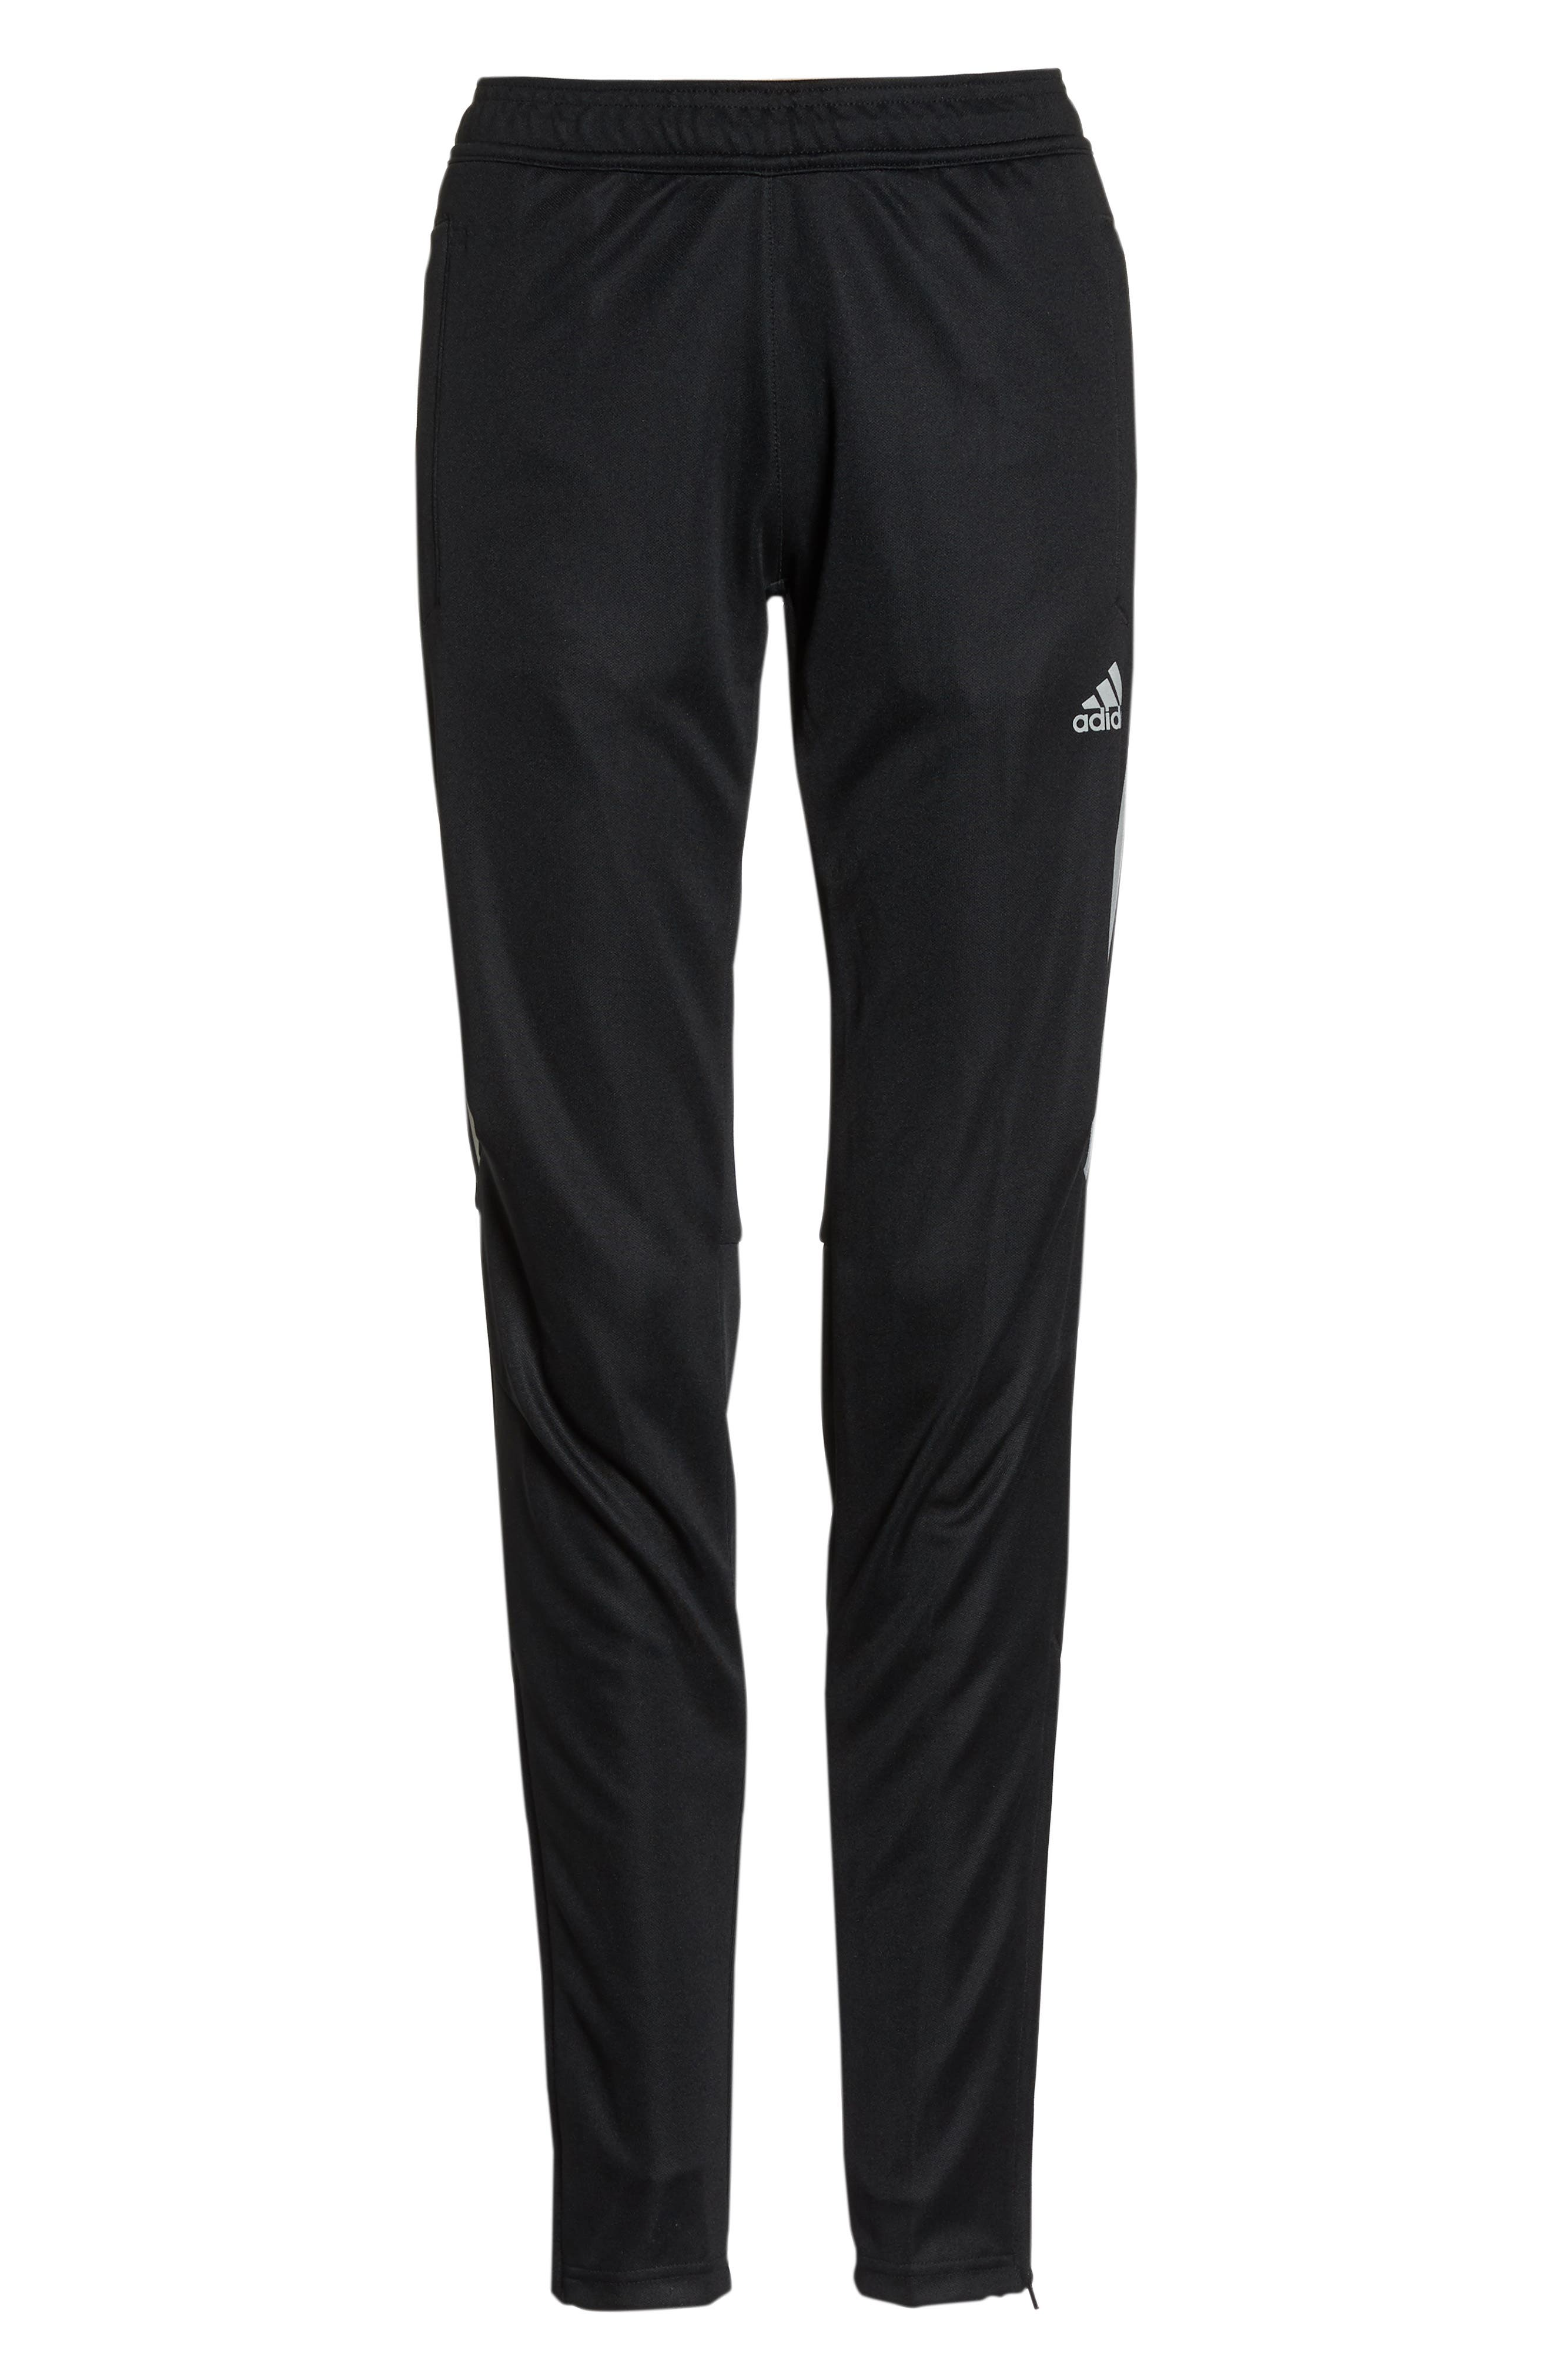 Tiro 17 Training Pants,                             Alternate thumbnail 7, color,                             BLACK/ REFLECTIVE SILVER